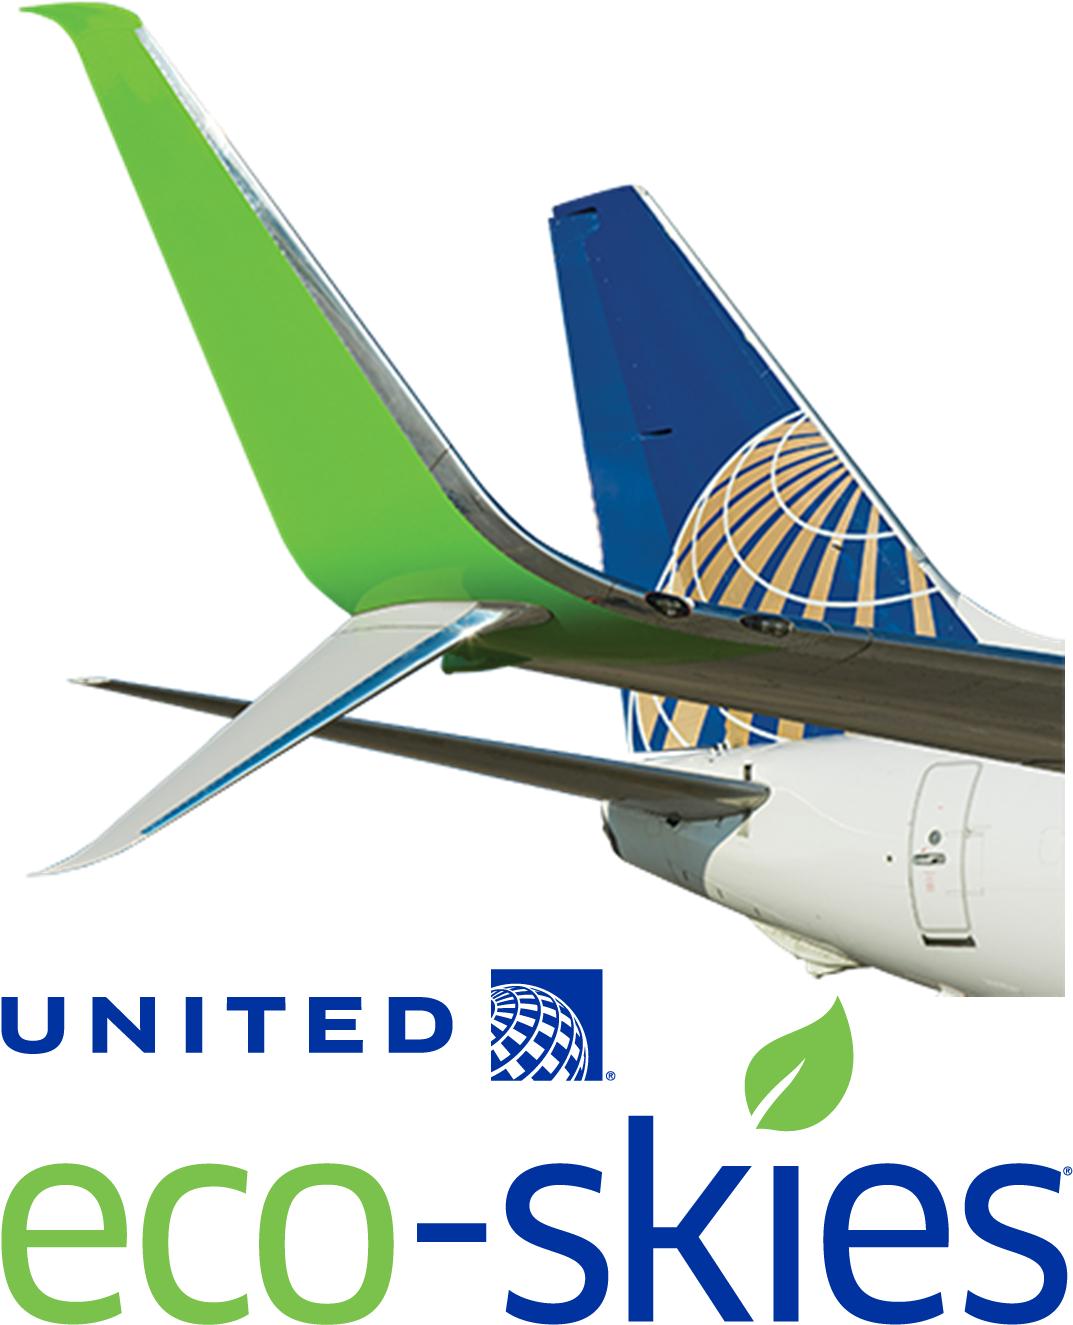 213-2134875_united-airlines-united-eco-skies-logo